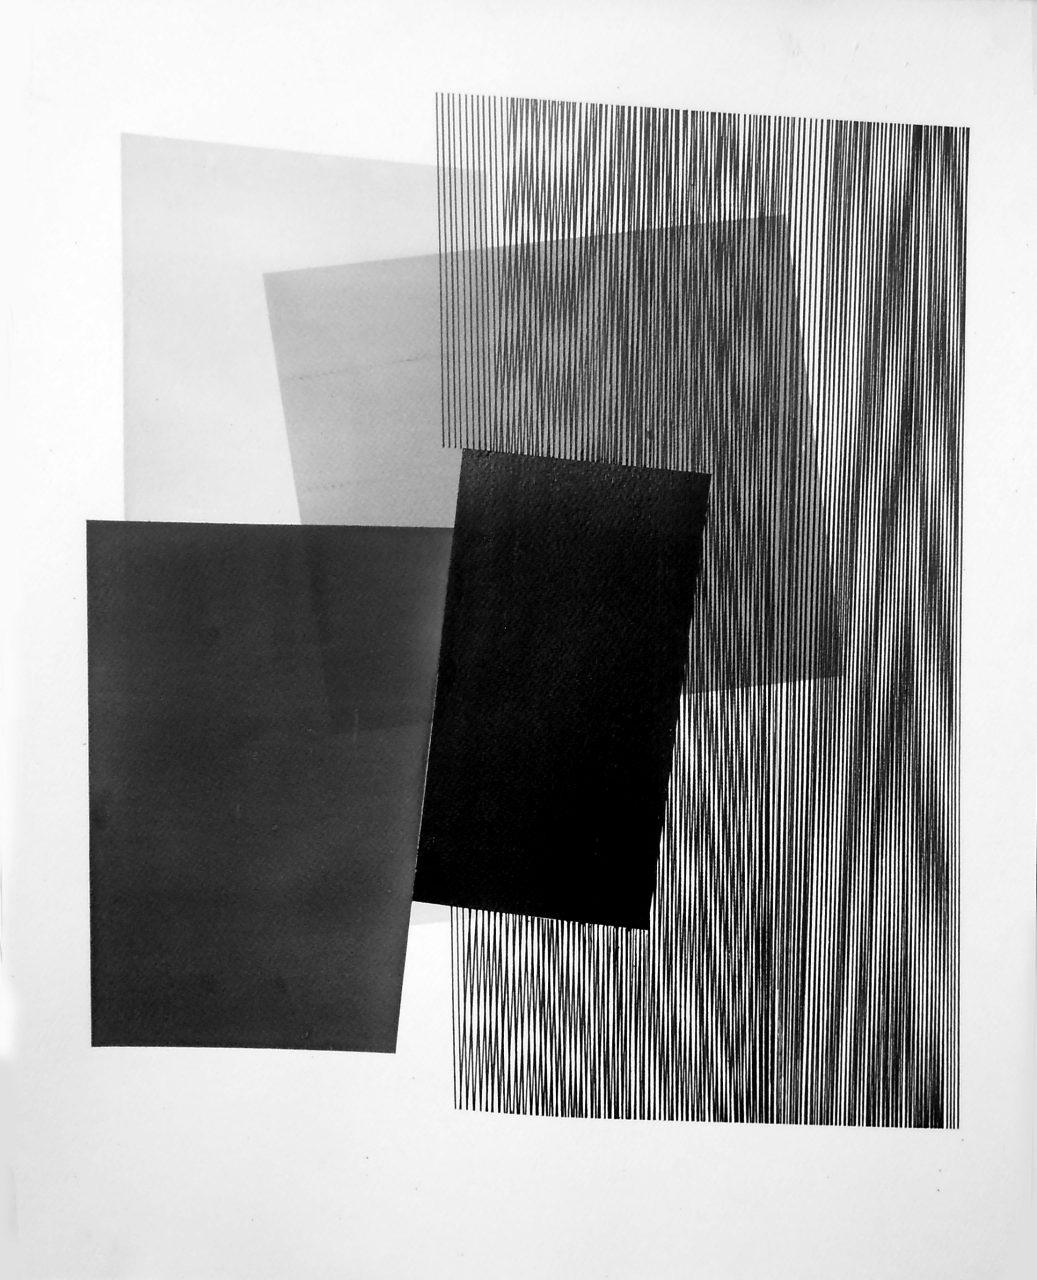 op171, ink on paper,40x50cm